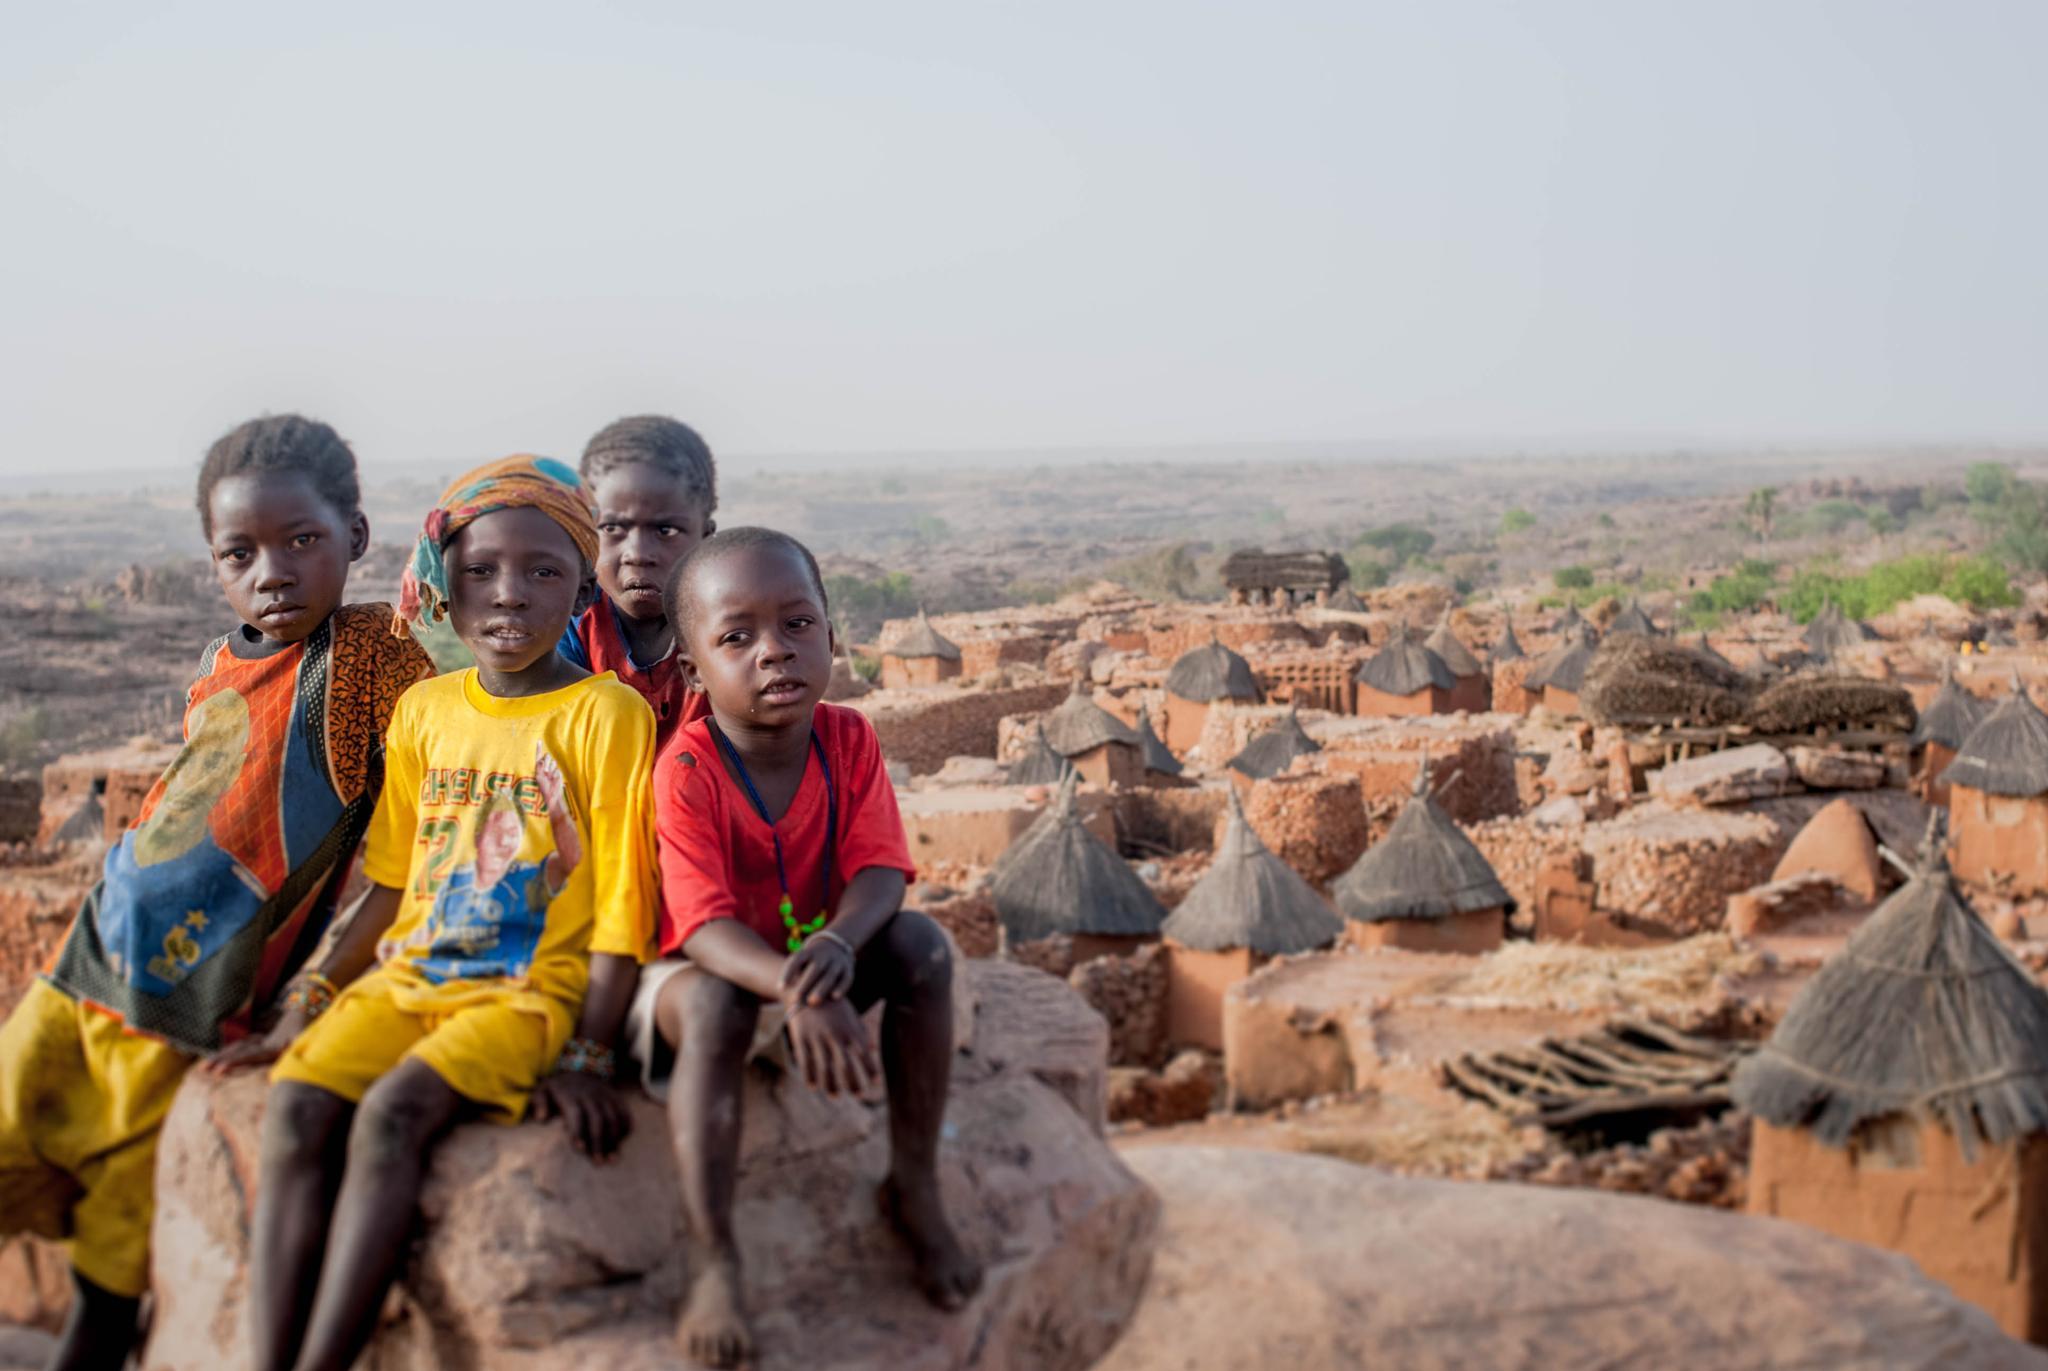 Dogon Children by Connie M Van Cleve